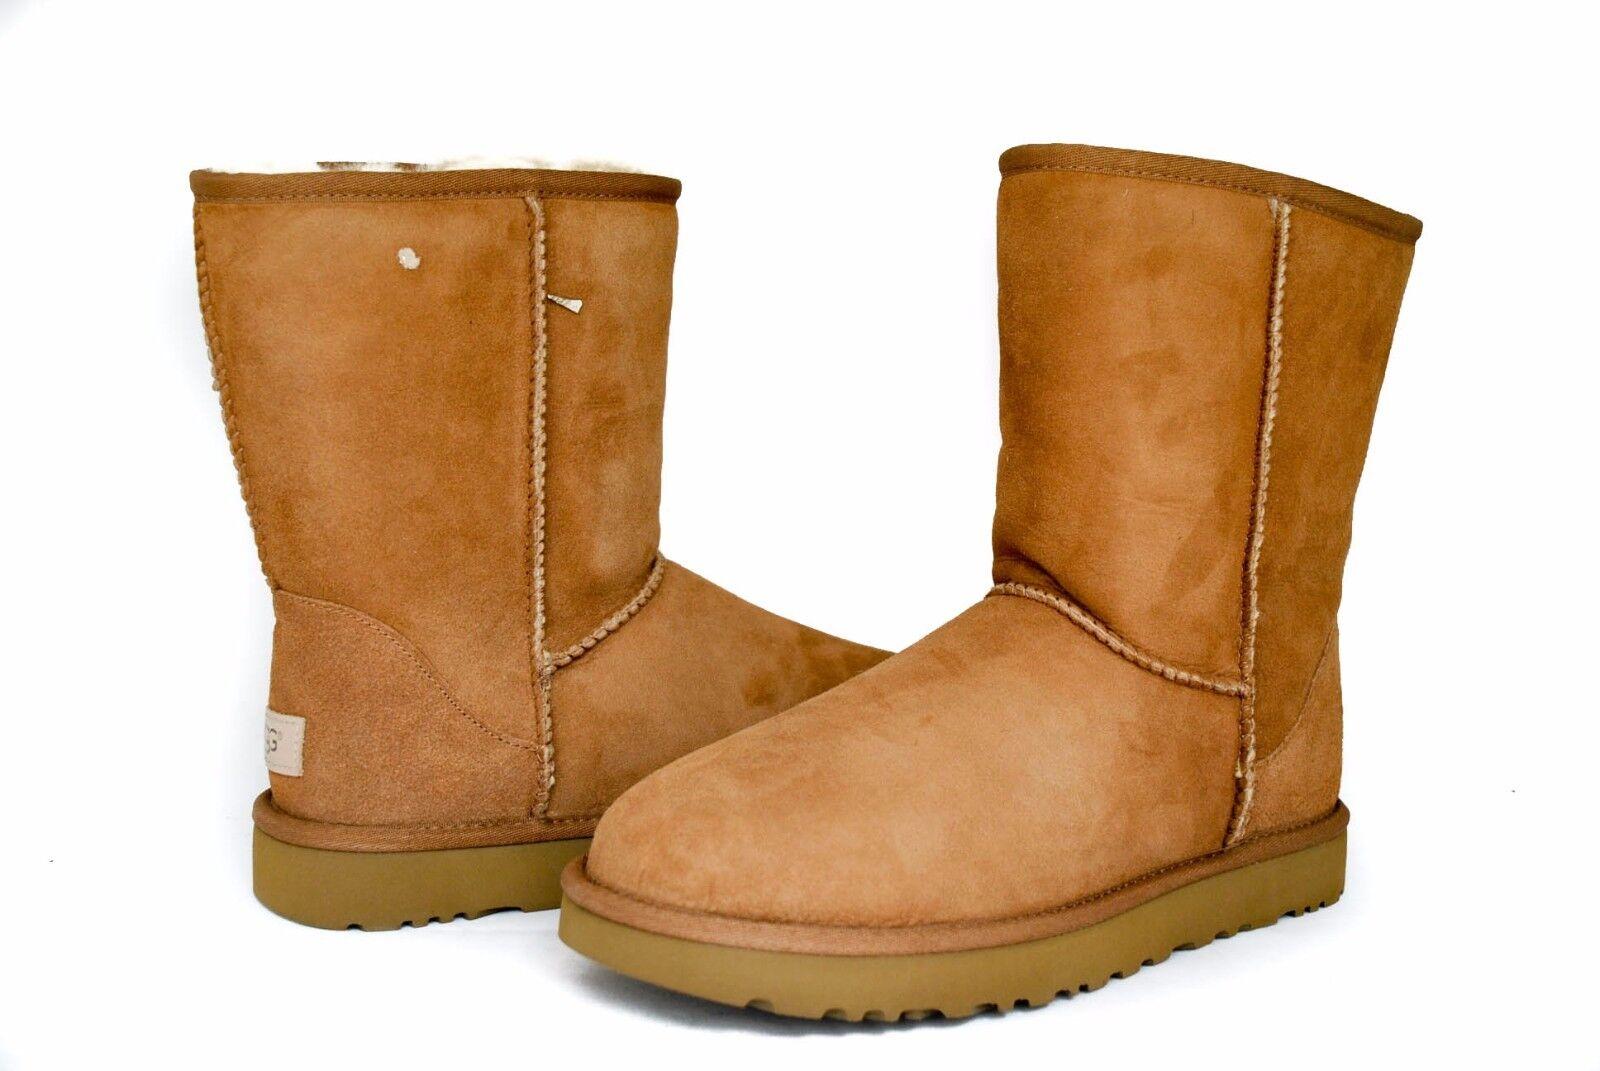 Boots - UGG Women's Classic Short 2 II Boots 1016223 Black Chestnut Grey NEW Version